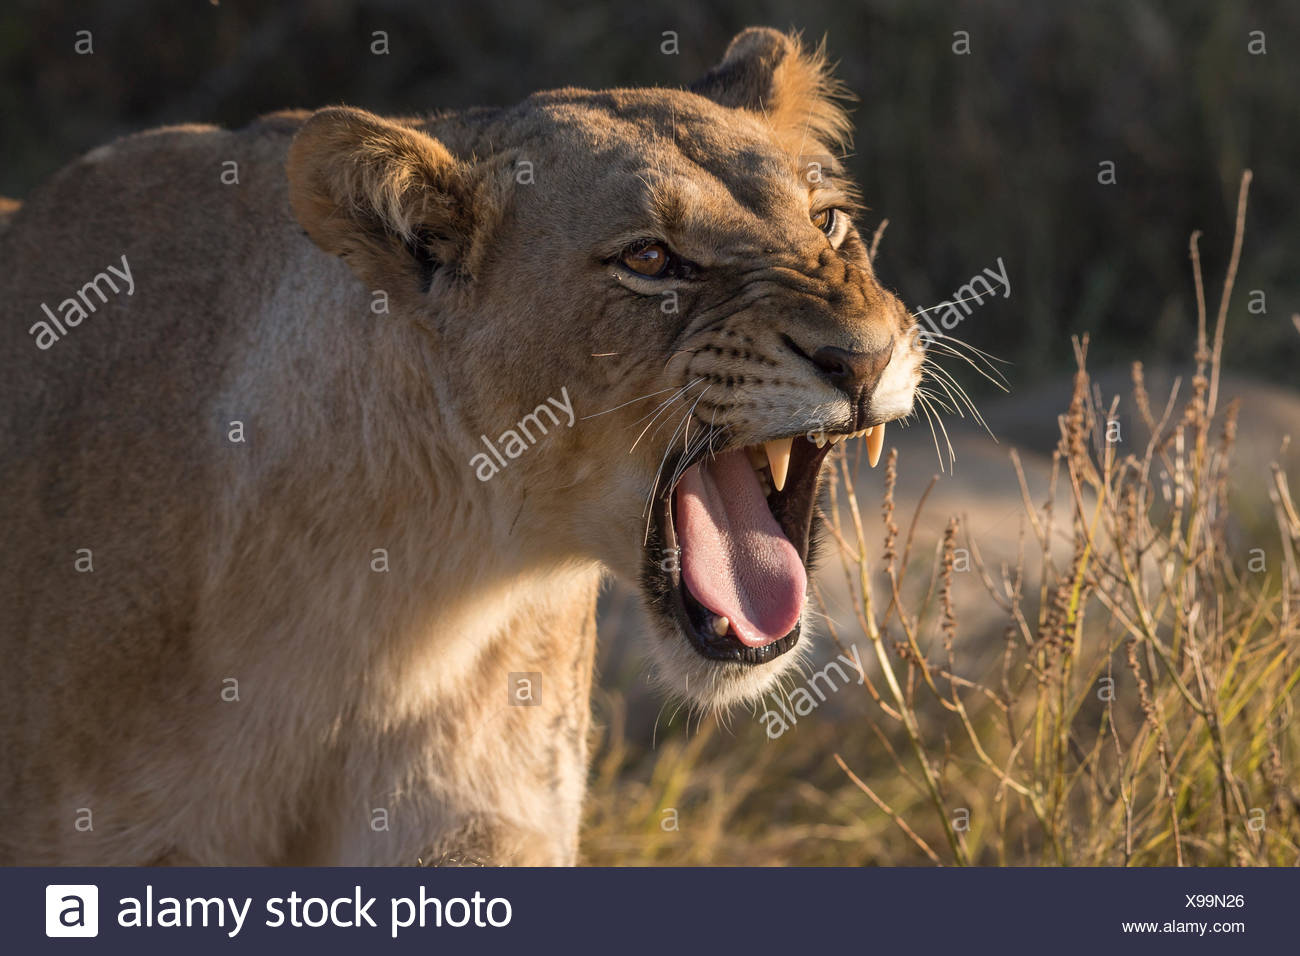 Lioness (Panthera leo) snarling, Chobe National Park, Botswana - Stock Image